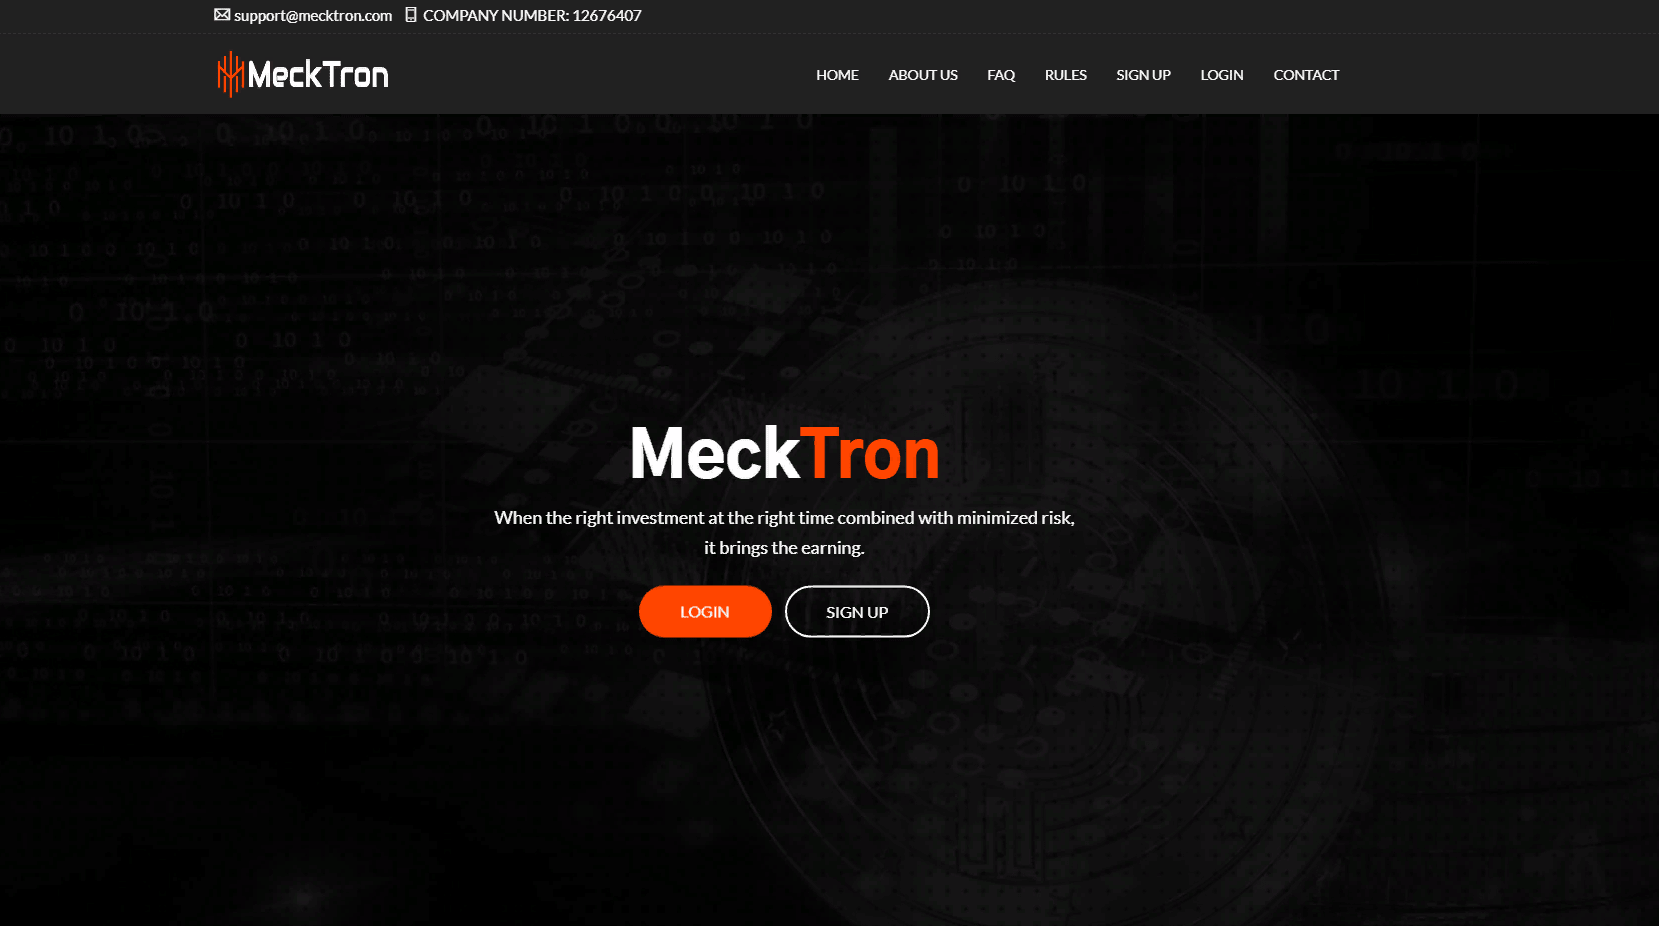 MeckTron